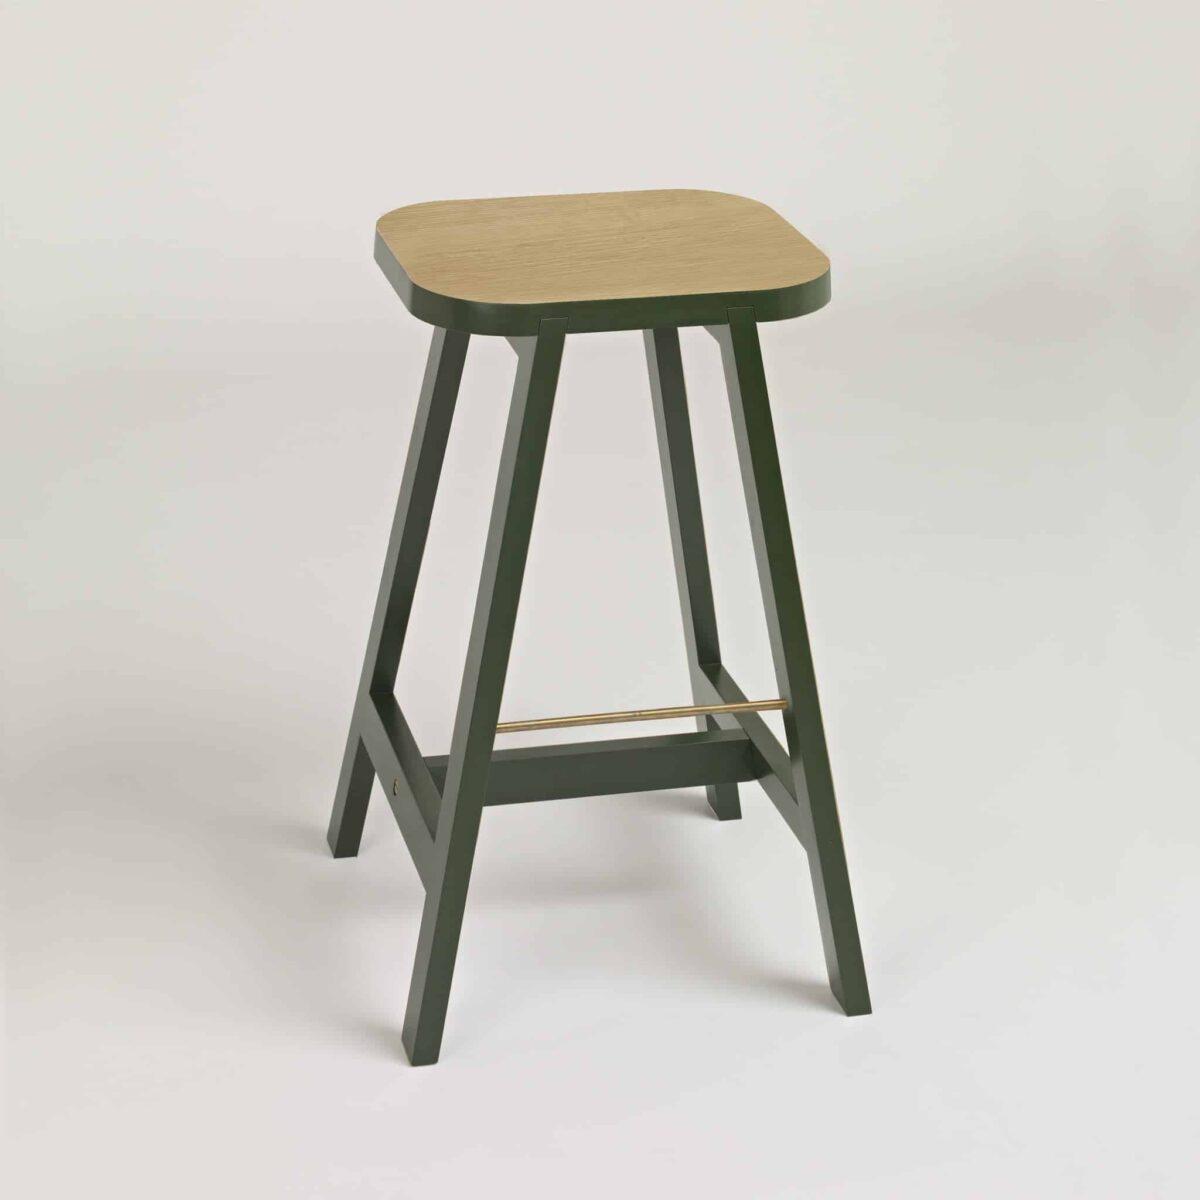 bar_stool_three_oak_green_lacquer_render.jpg